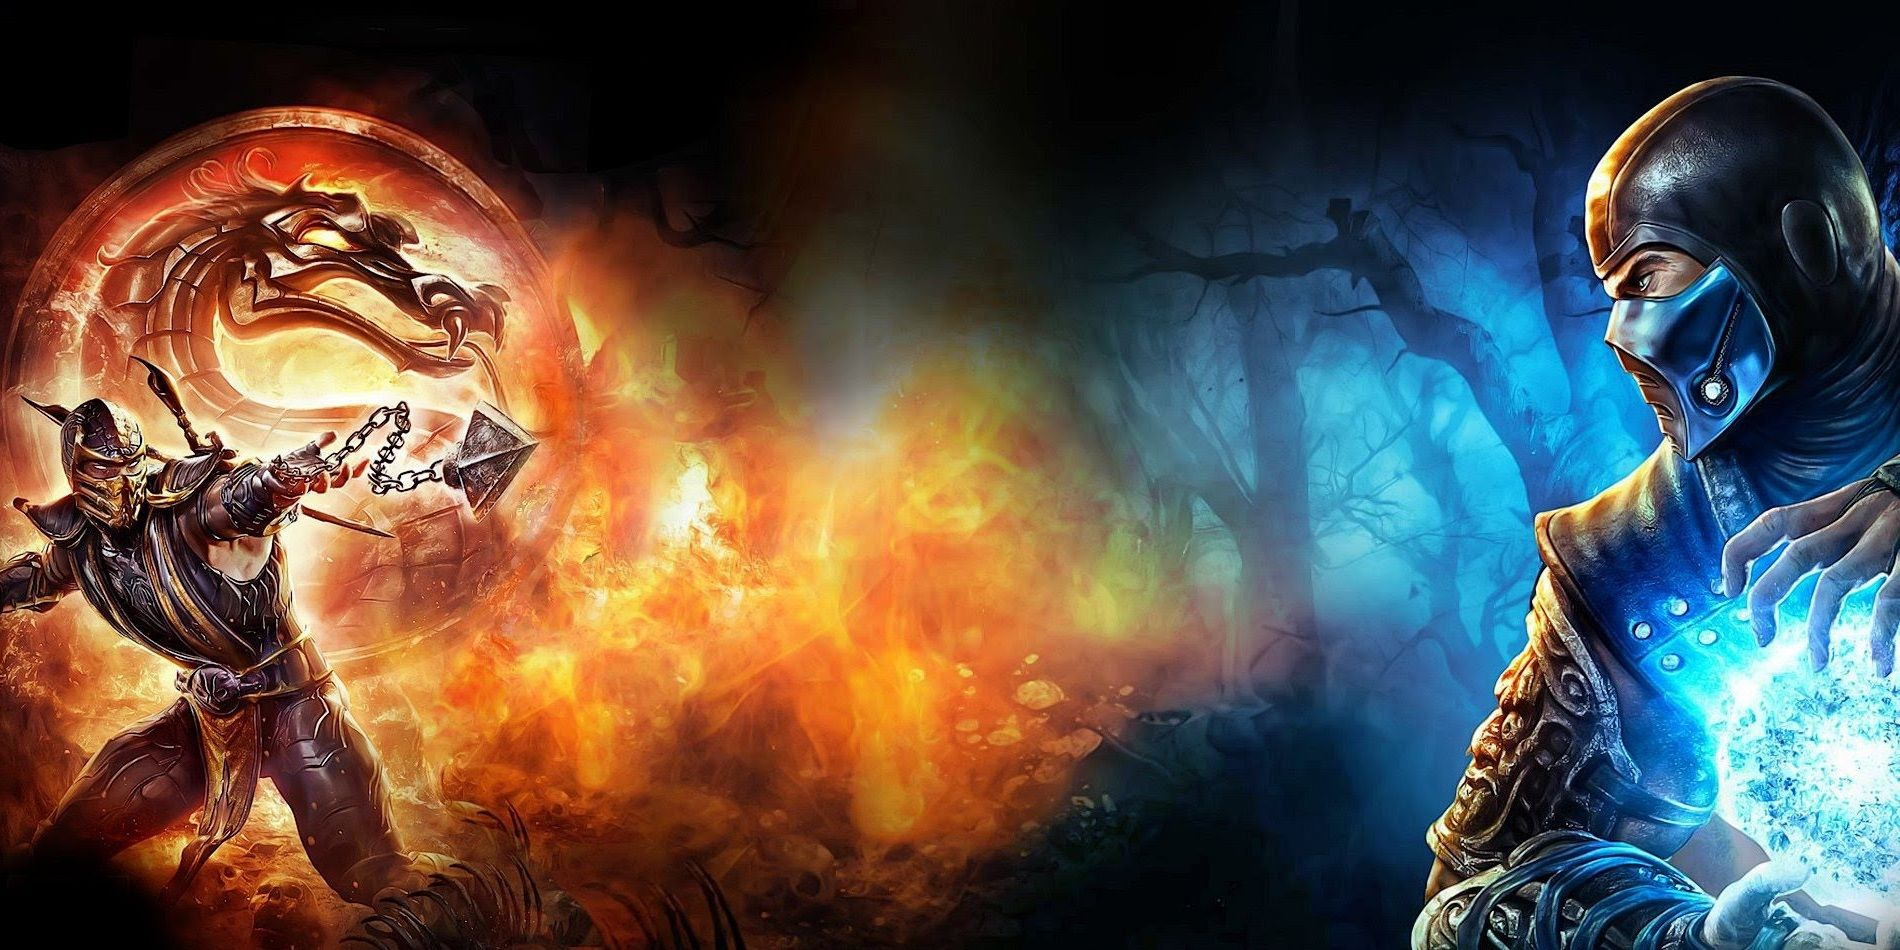 15 Best Mortal Kombat Rivalries | ScreenRant